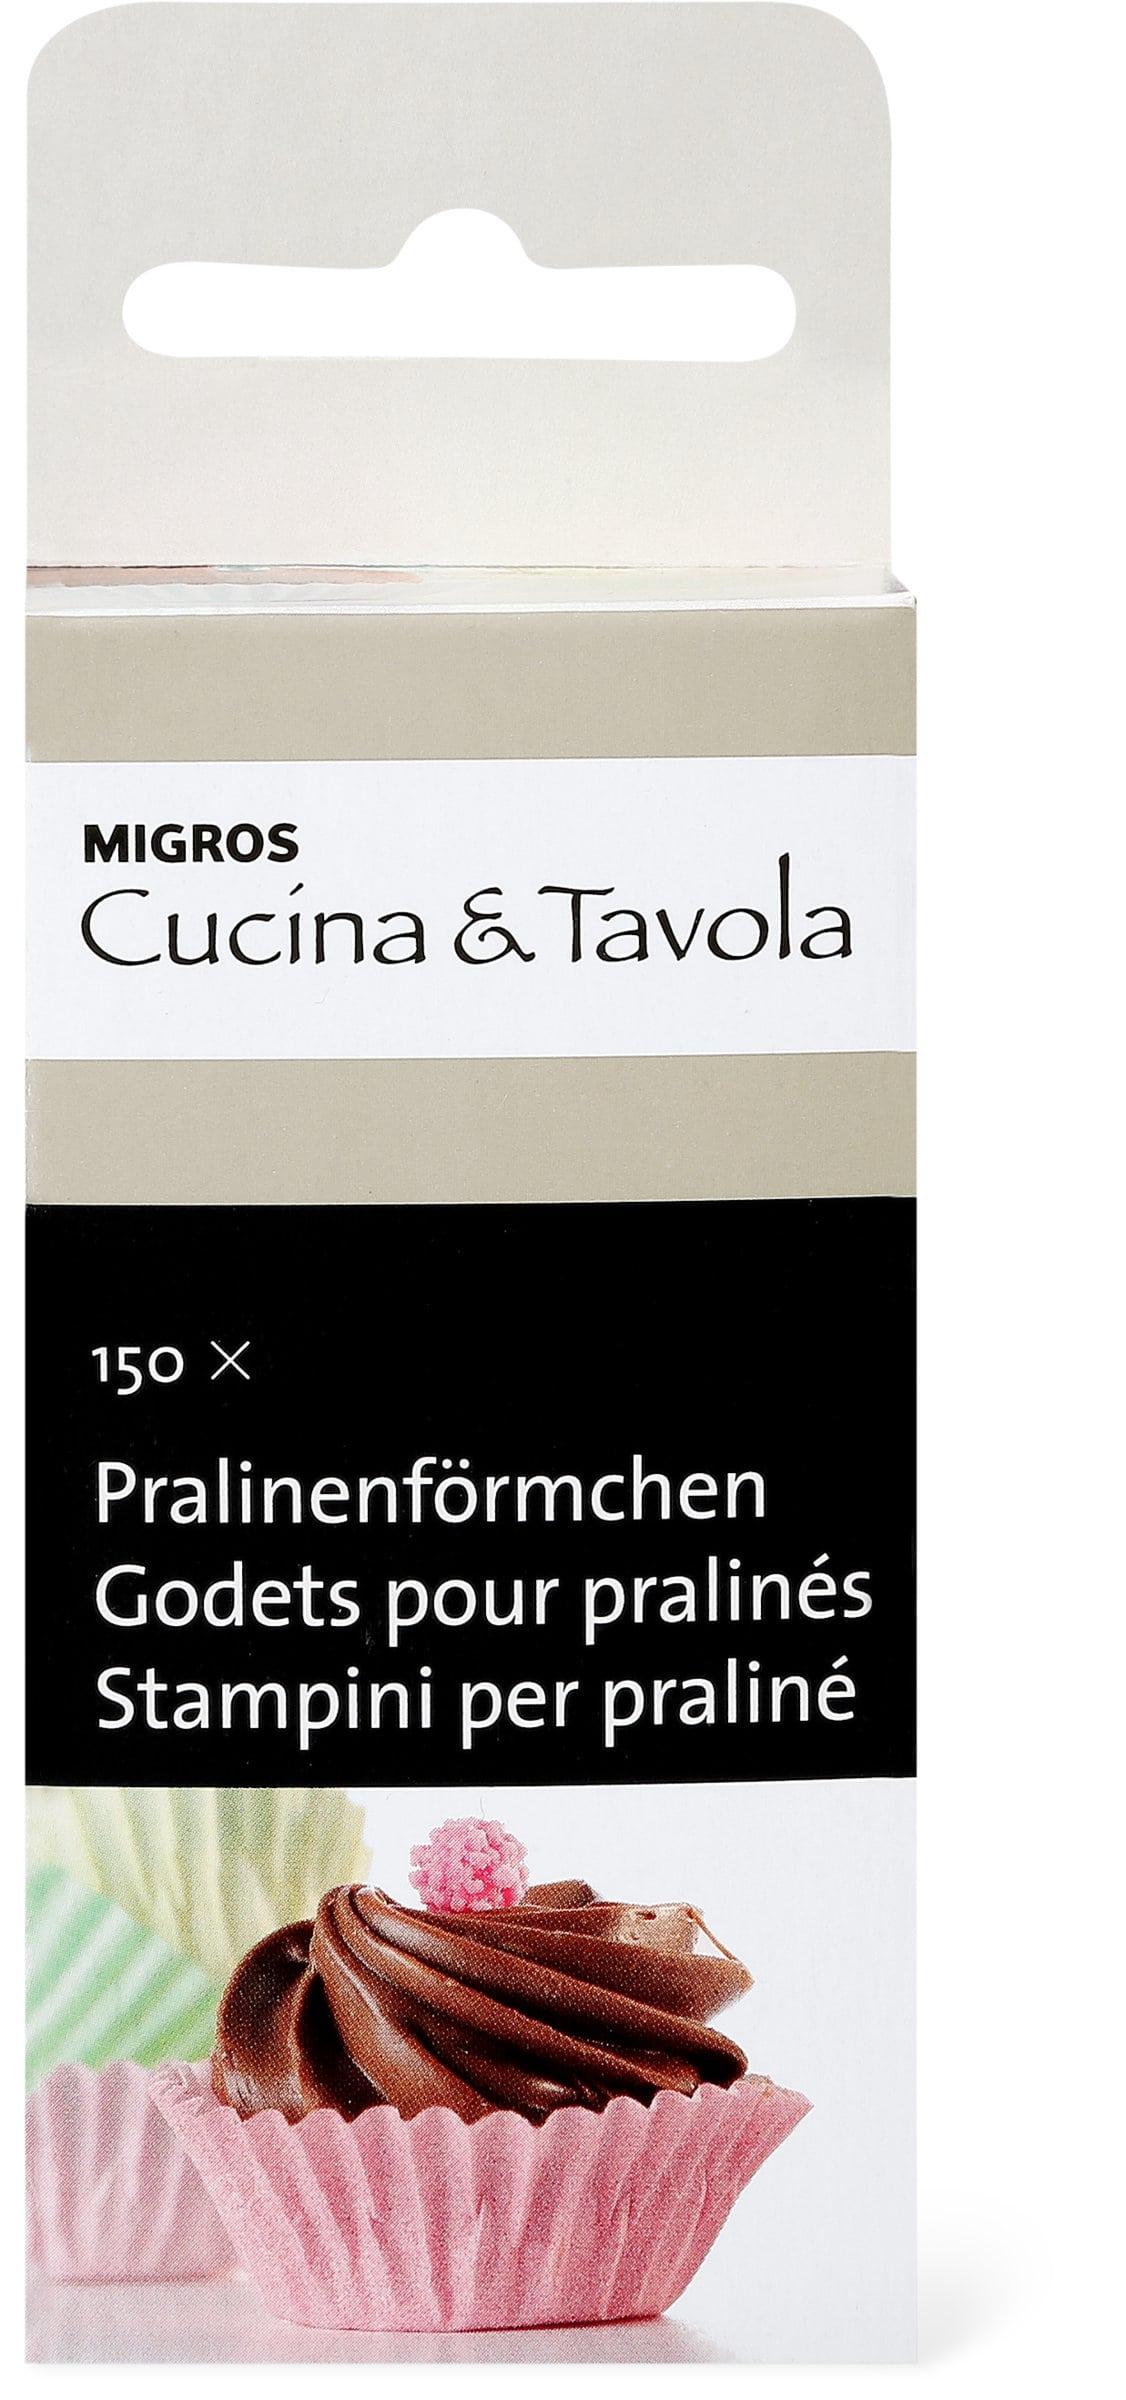 Cucina & Tavola Stampini per praliné